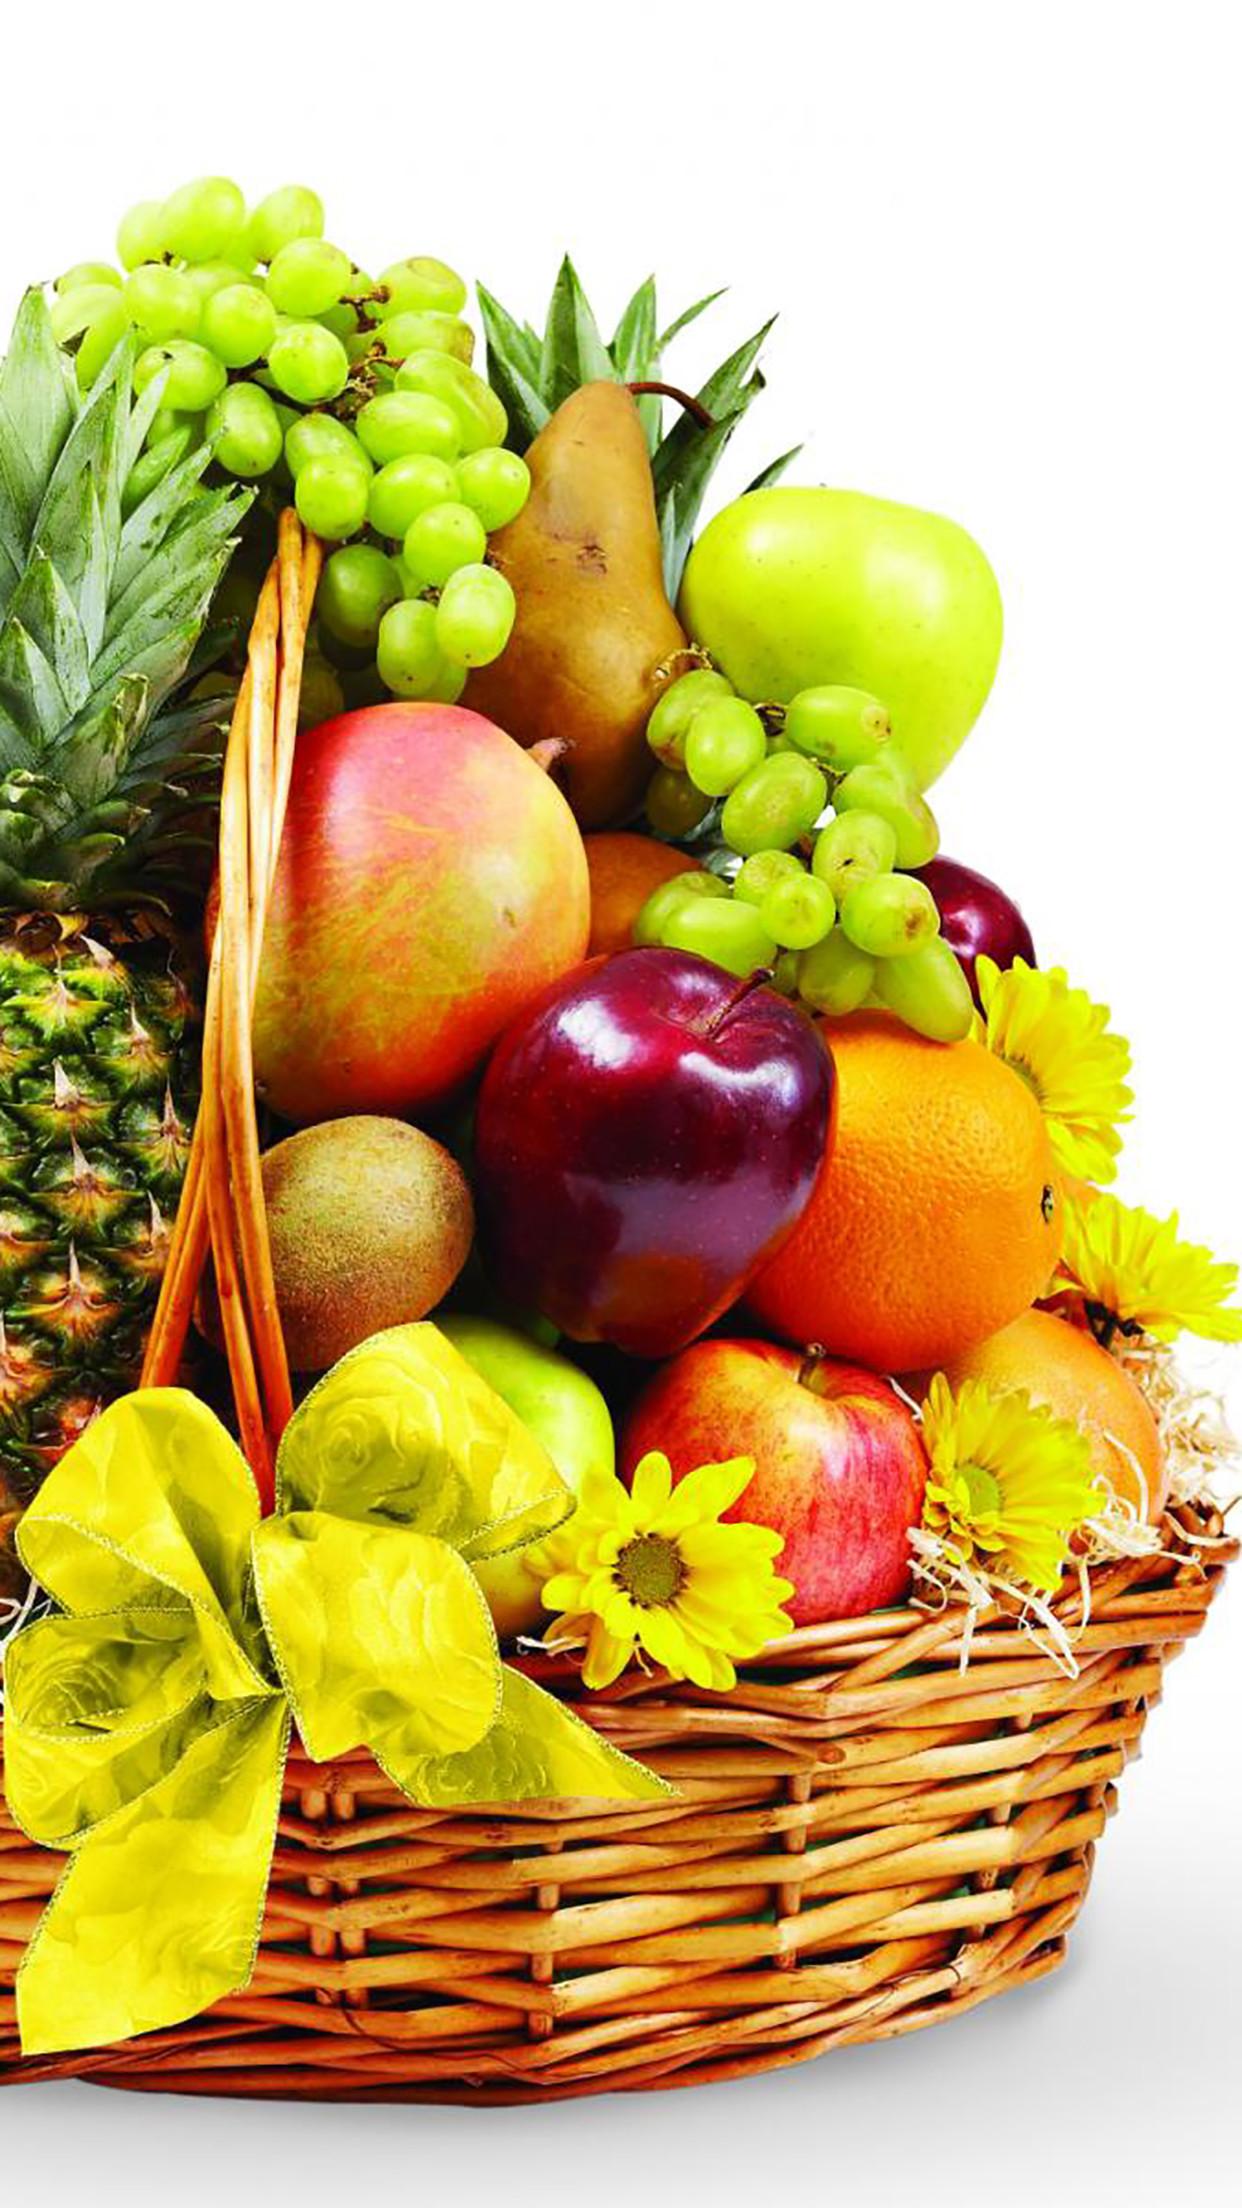 59 Fruit Basket Wallpapers on WallpaperPlay 1242x2208